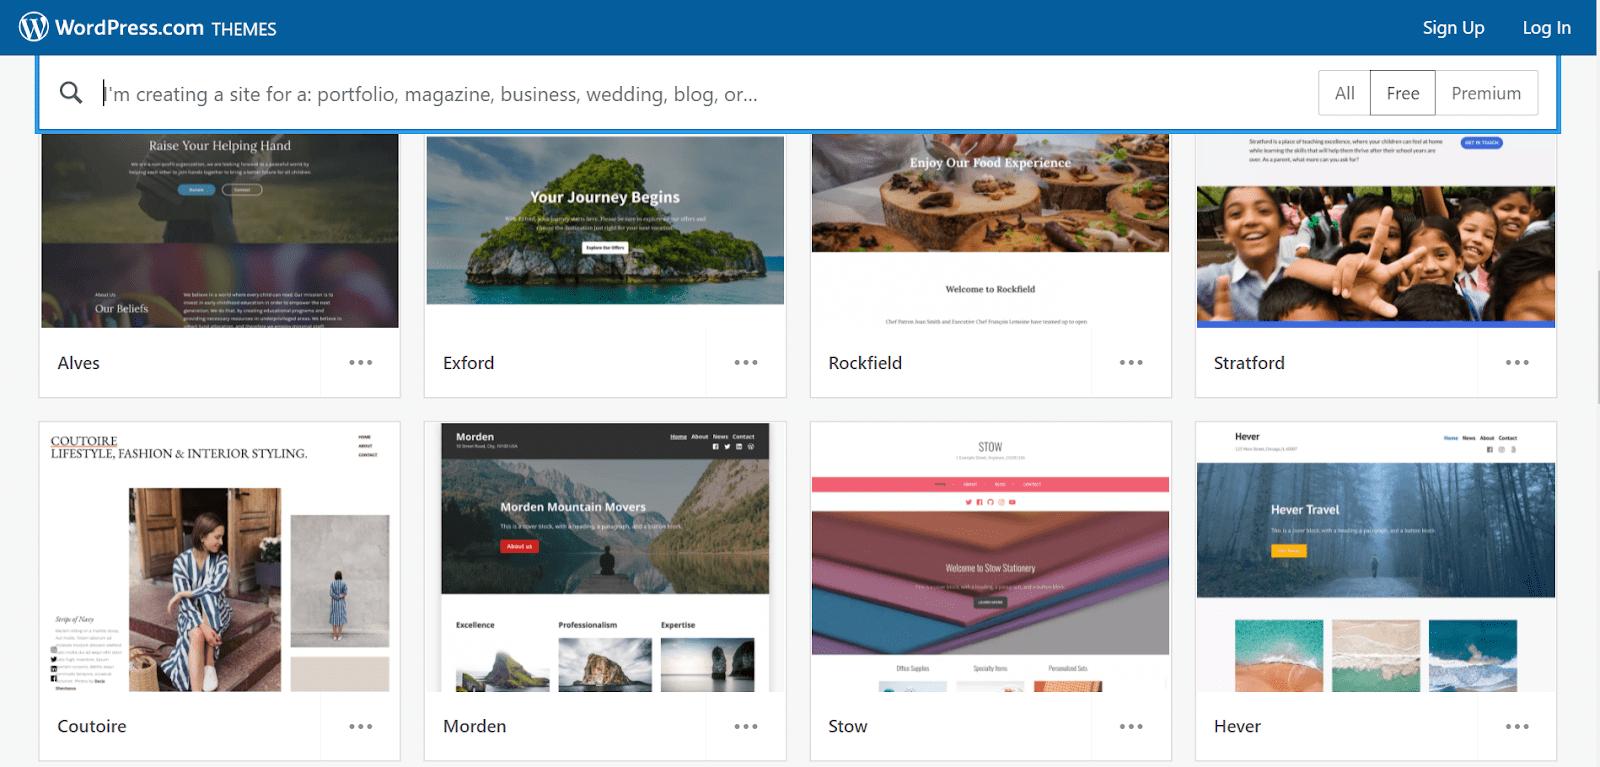 Wordpress.com template library